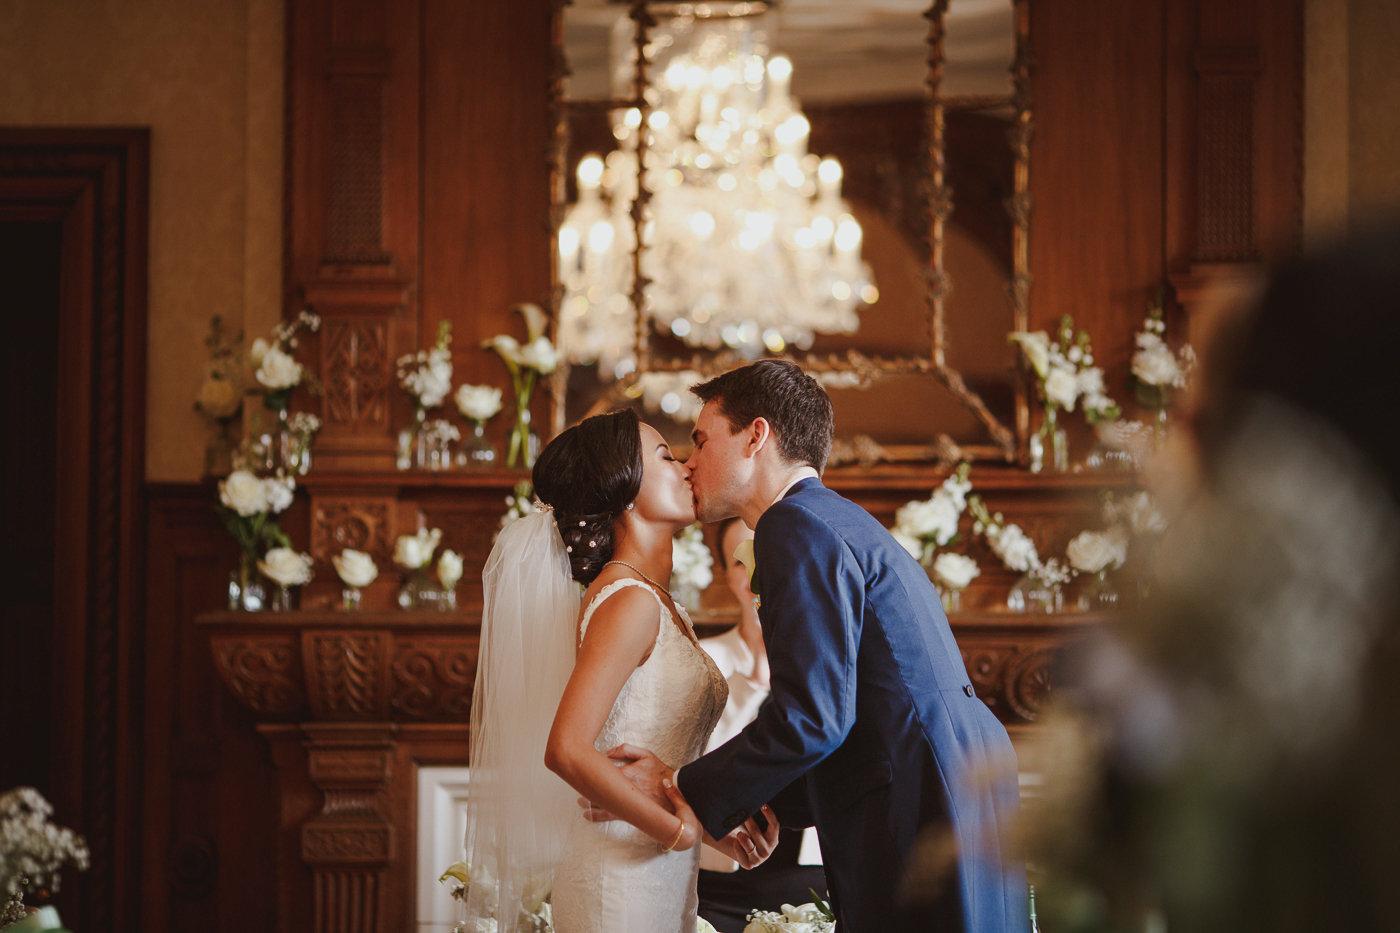 froyle-park-wedding-photography-19.jpg